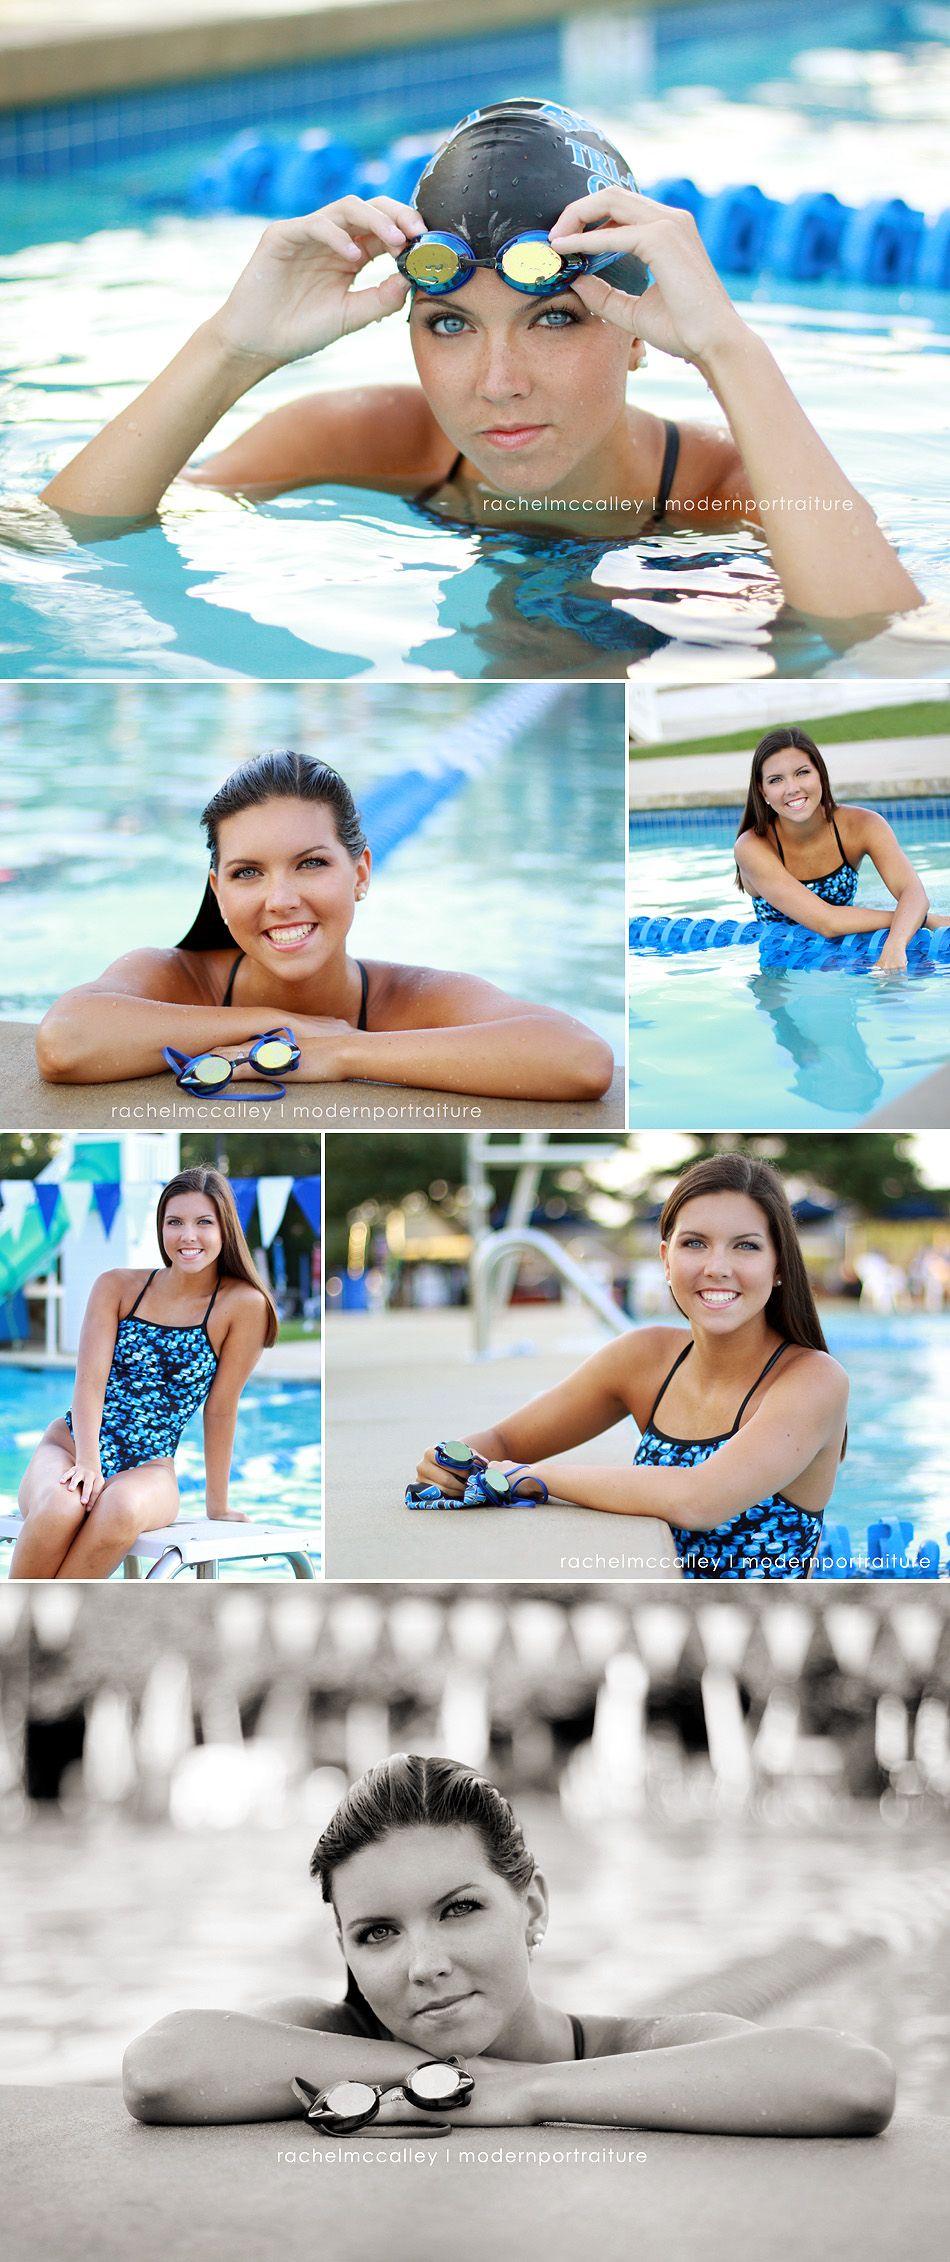 Seems me, Sweet girls swim pool authoritative